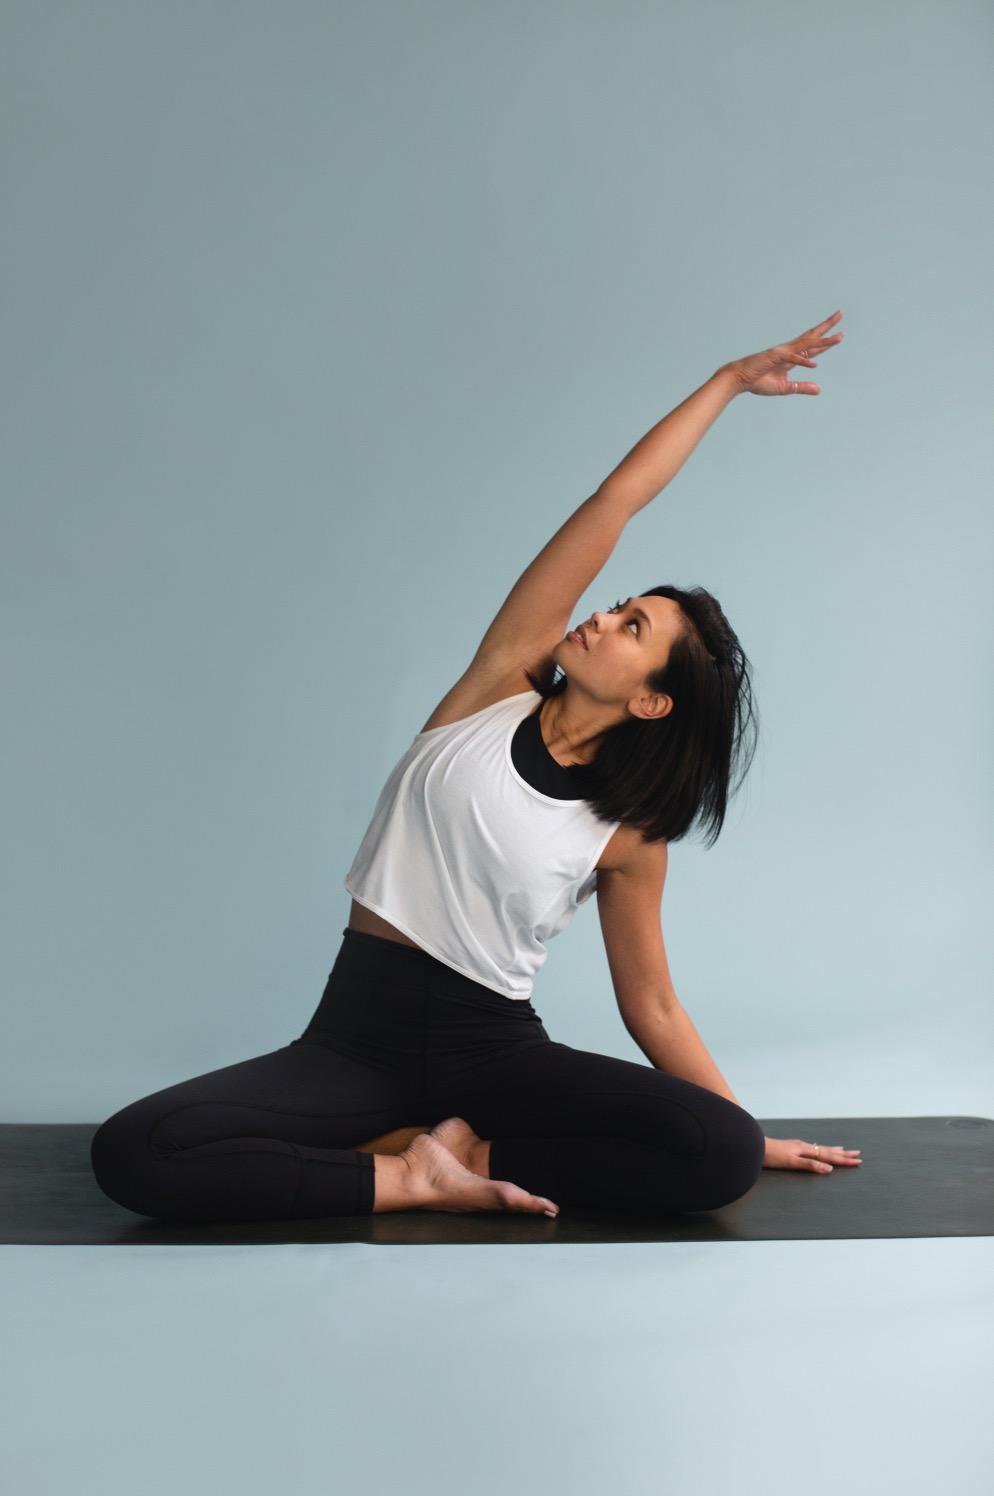 Image credit Vinny Yoga